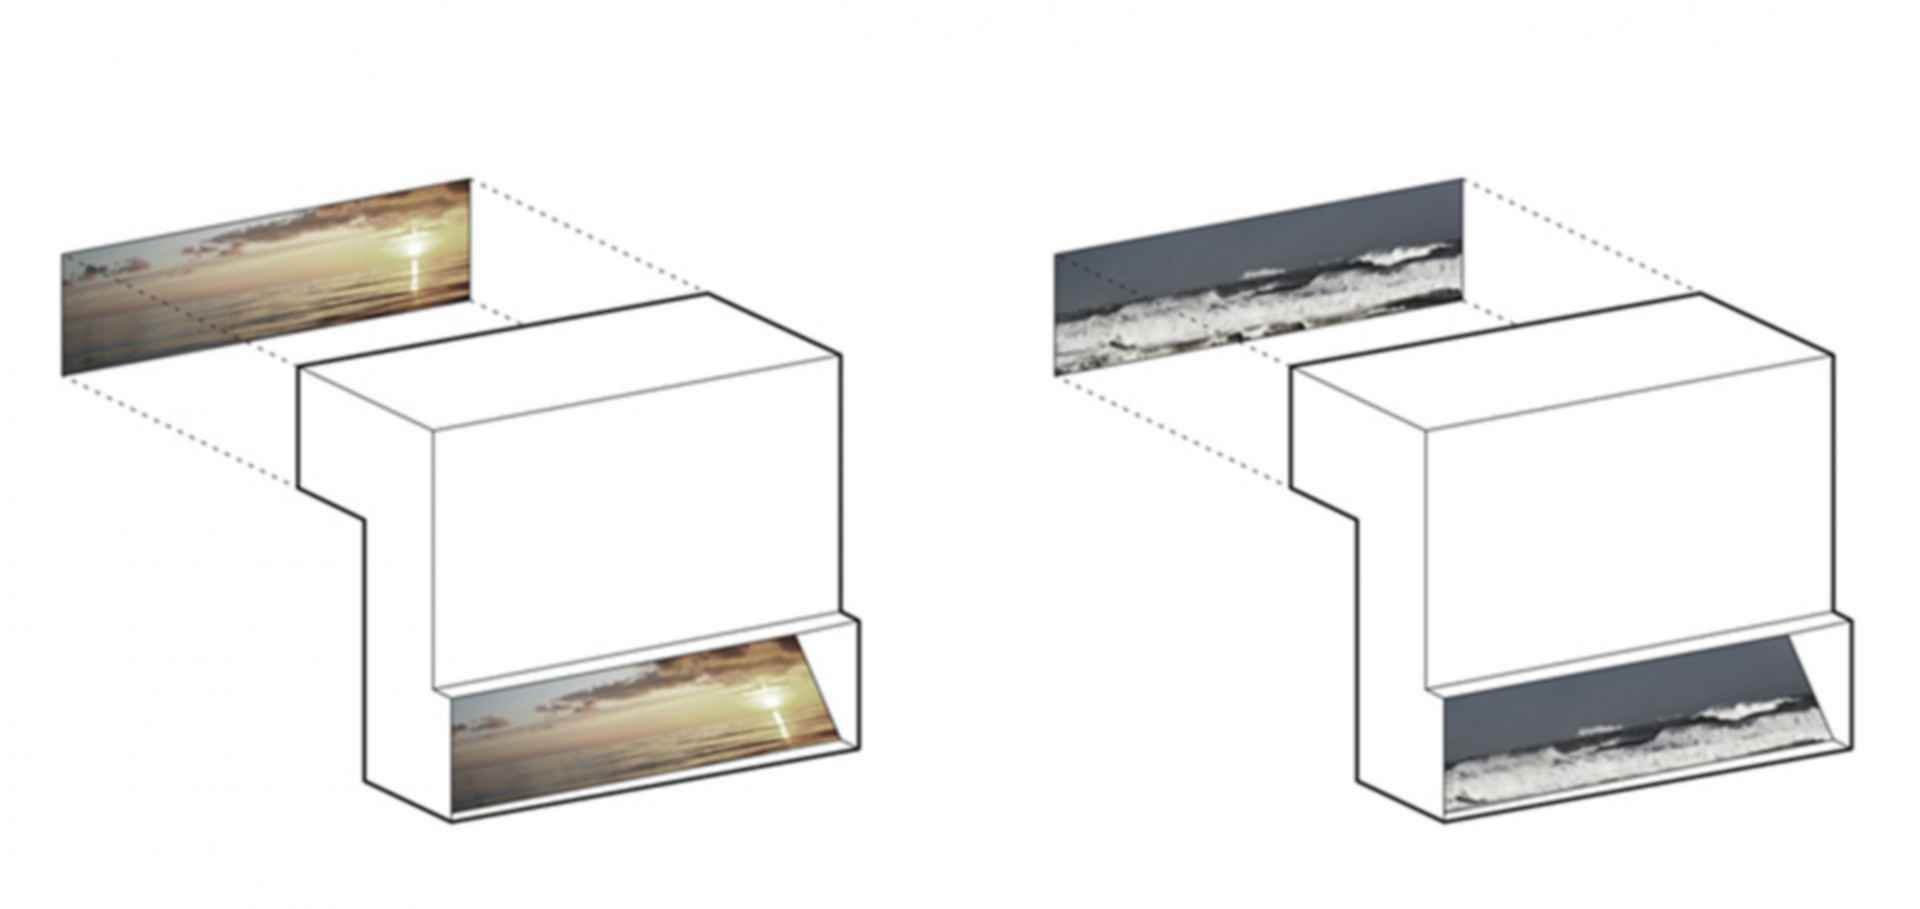 Seaside Periscope - Floor plan